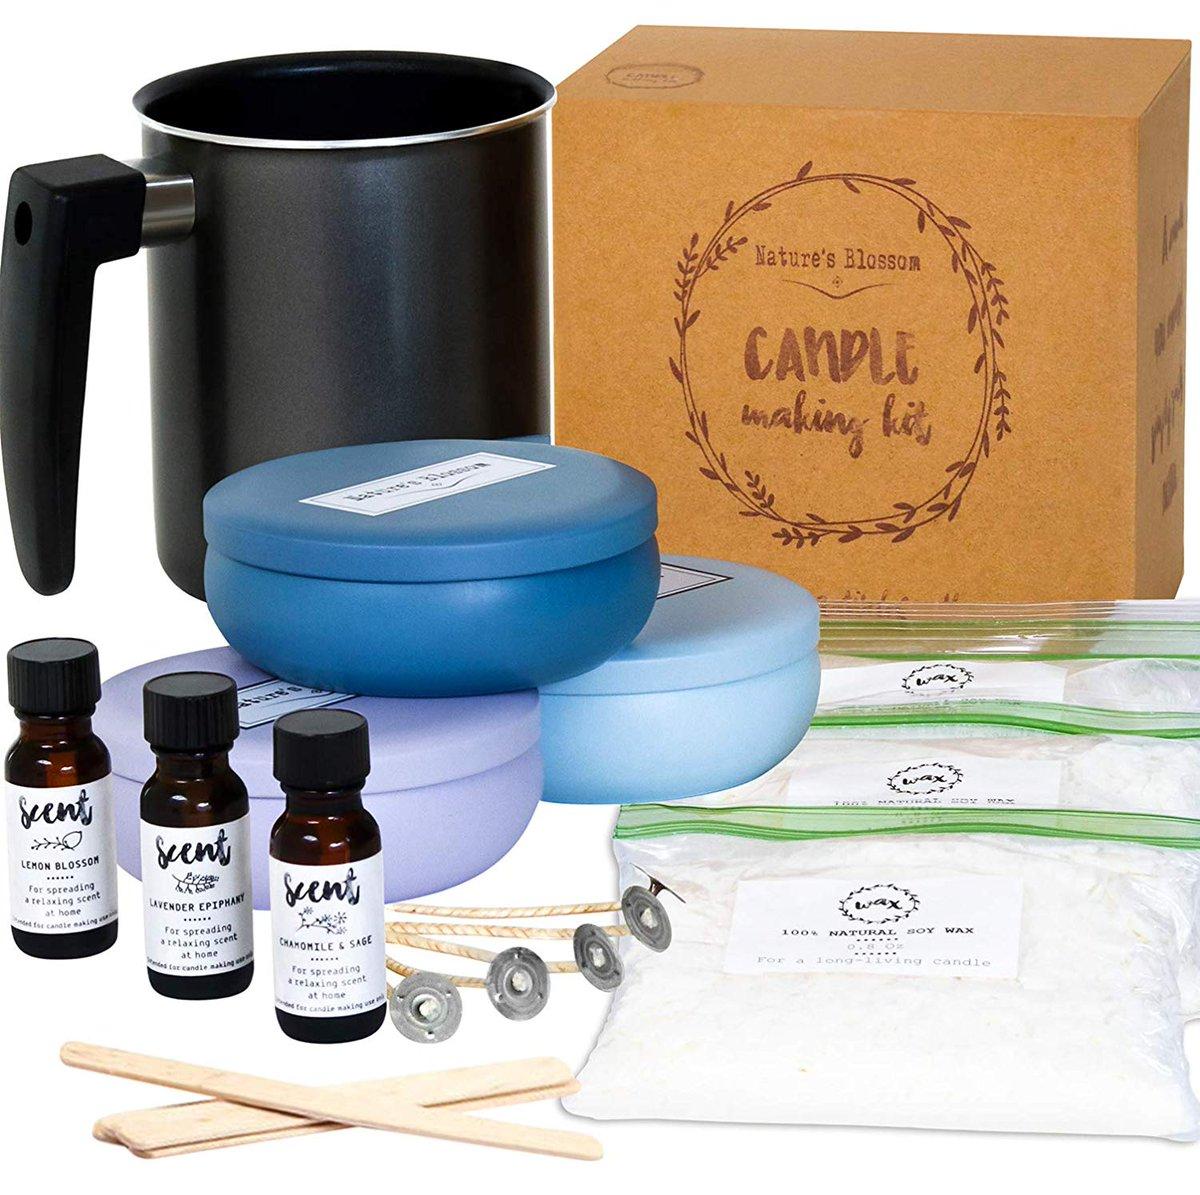 What a lovely #giftidea!! Save $25 off the candle making kit!! > https://amzn.to/2lzLPpY #primeday2019 #AmazonPrimeDay #AmazonCanada